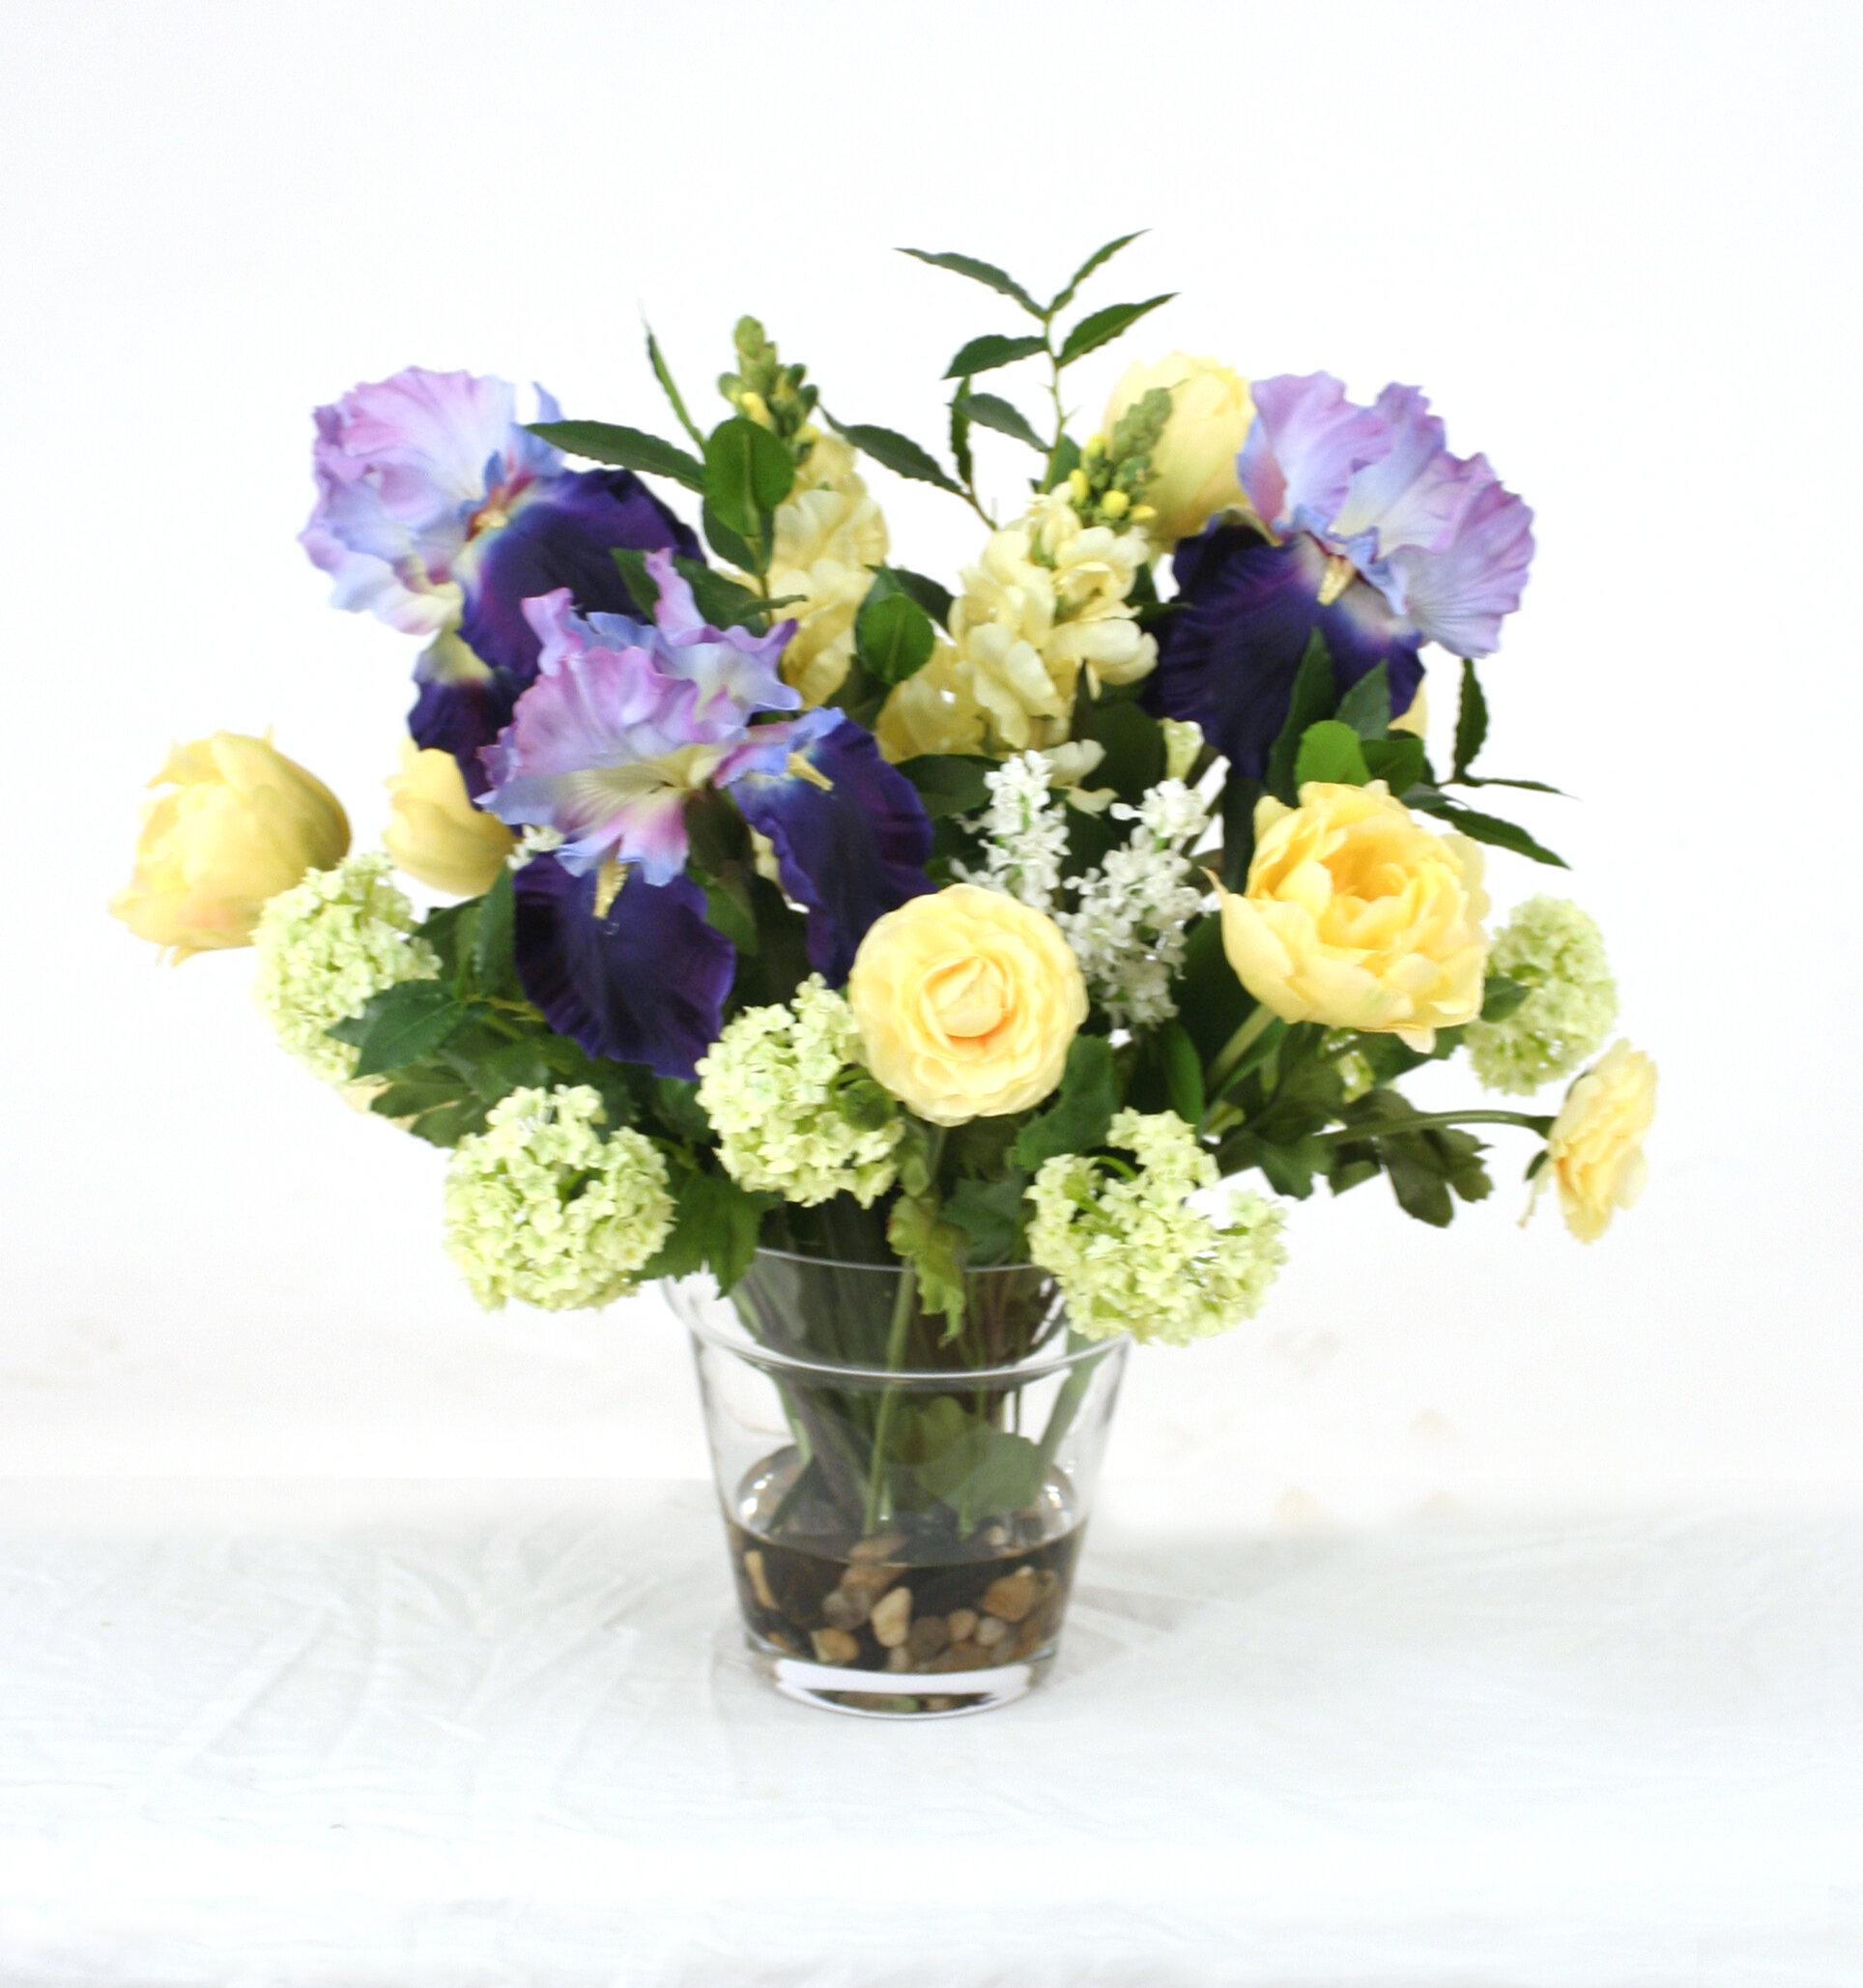 Distinctive Designs Waterlook Glass Flower Pot Vase | Wayfair